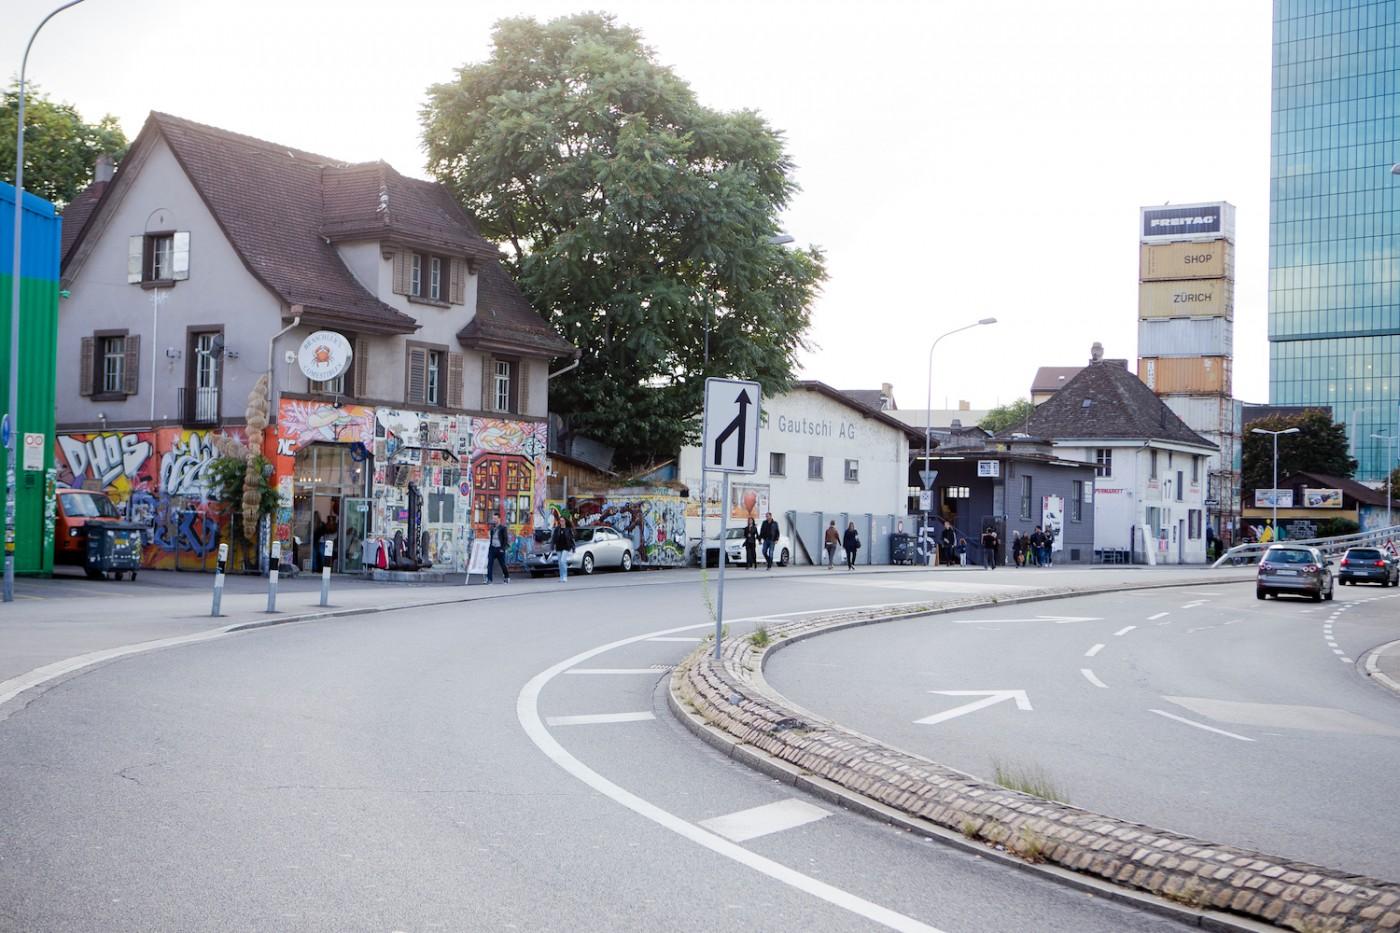 Zürich, Frau Gerold, Viadukt Zürich, Shoppen Zürich, Toni Areal